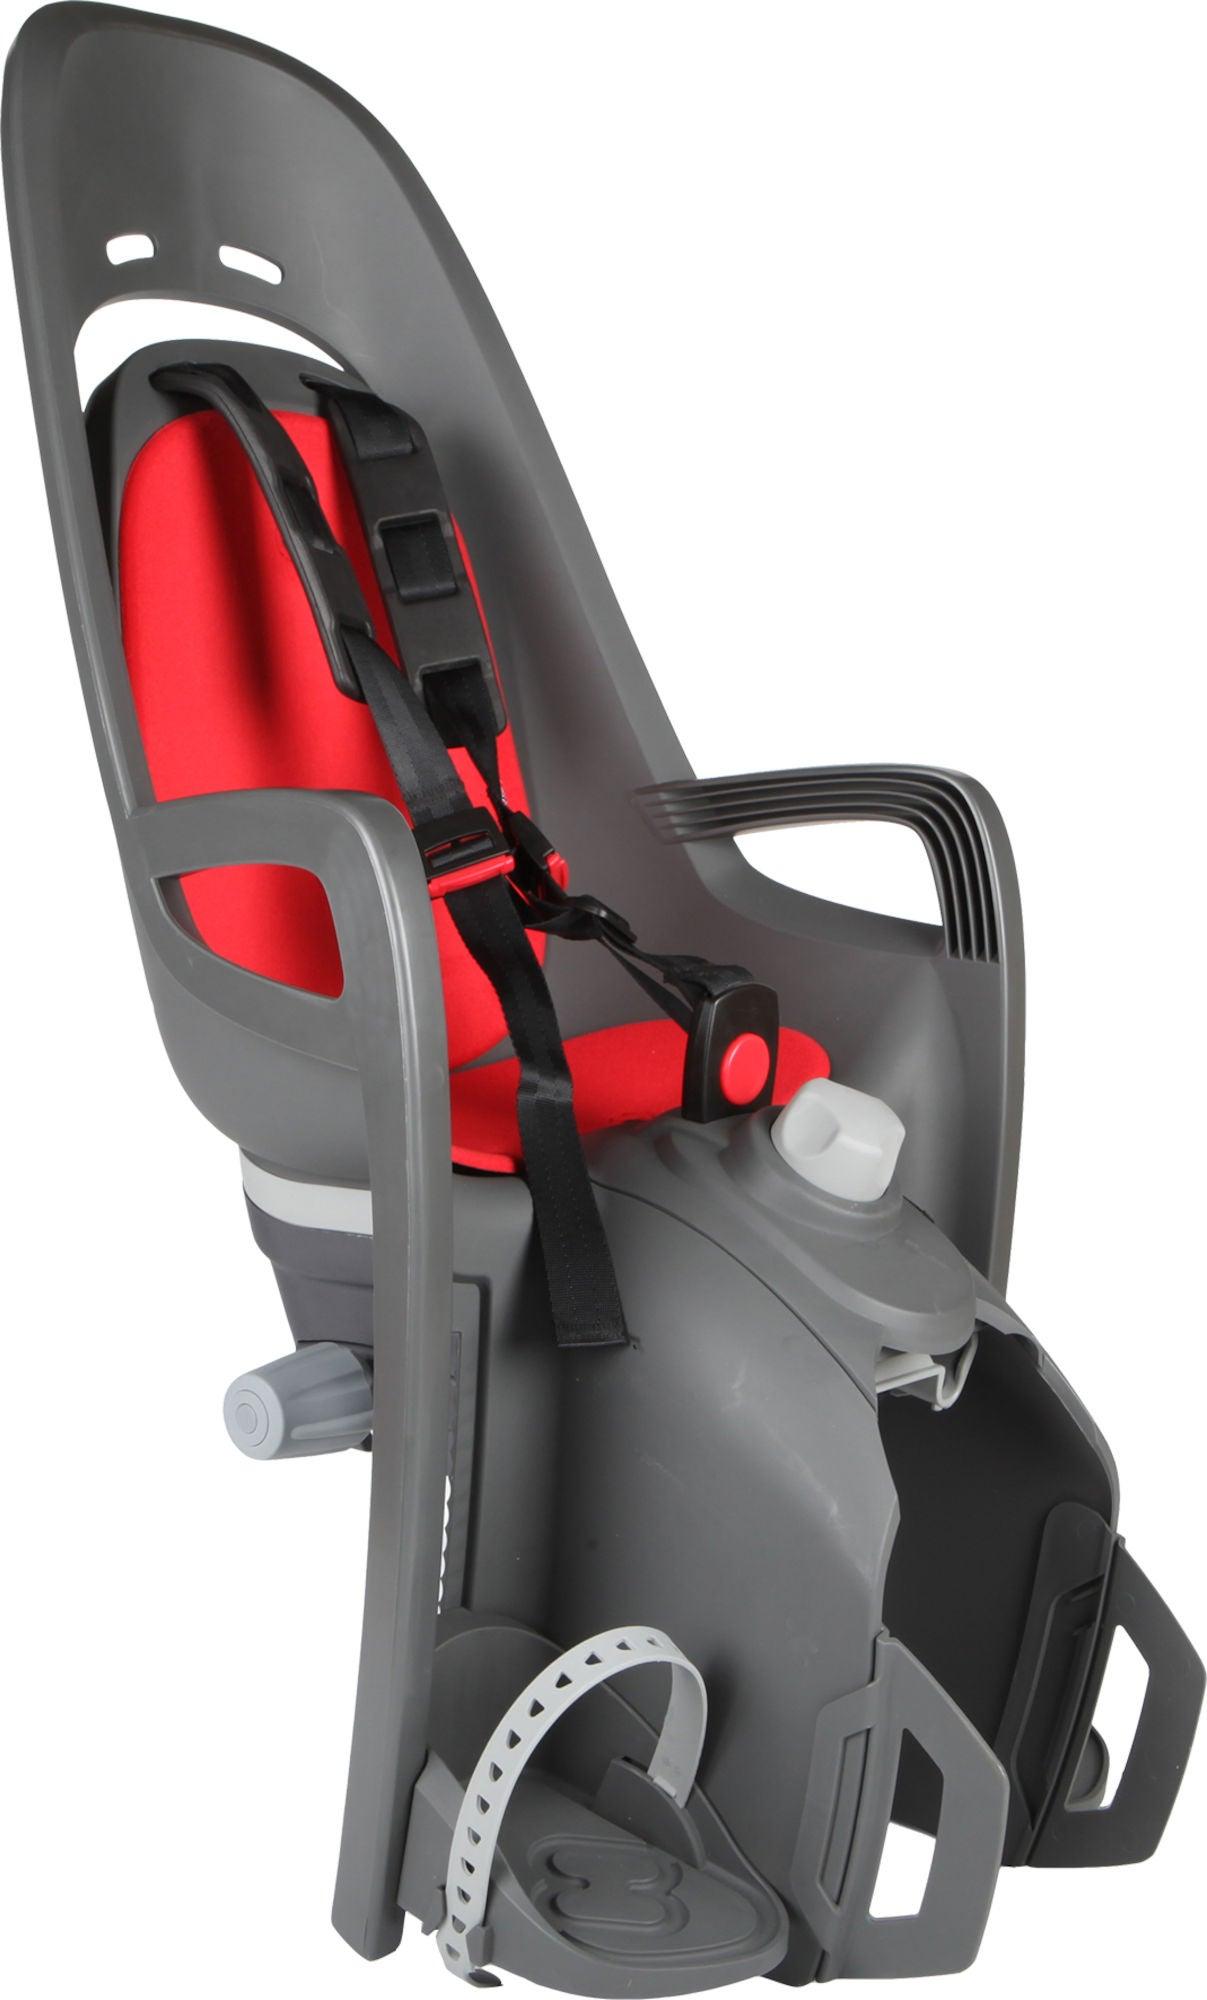 Hamax Zenith Relax Cykelstol inkl. Bagagebærer-adapter , Grå/Rød | Bike seat